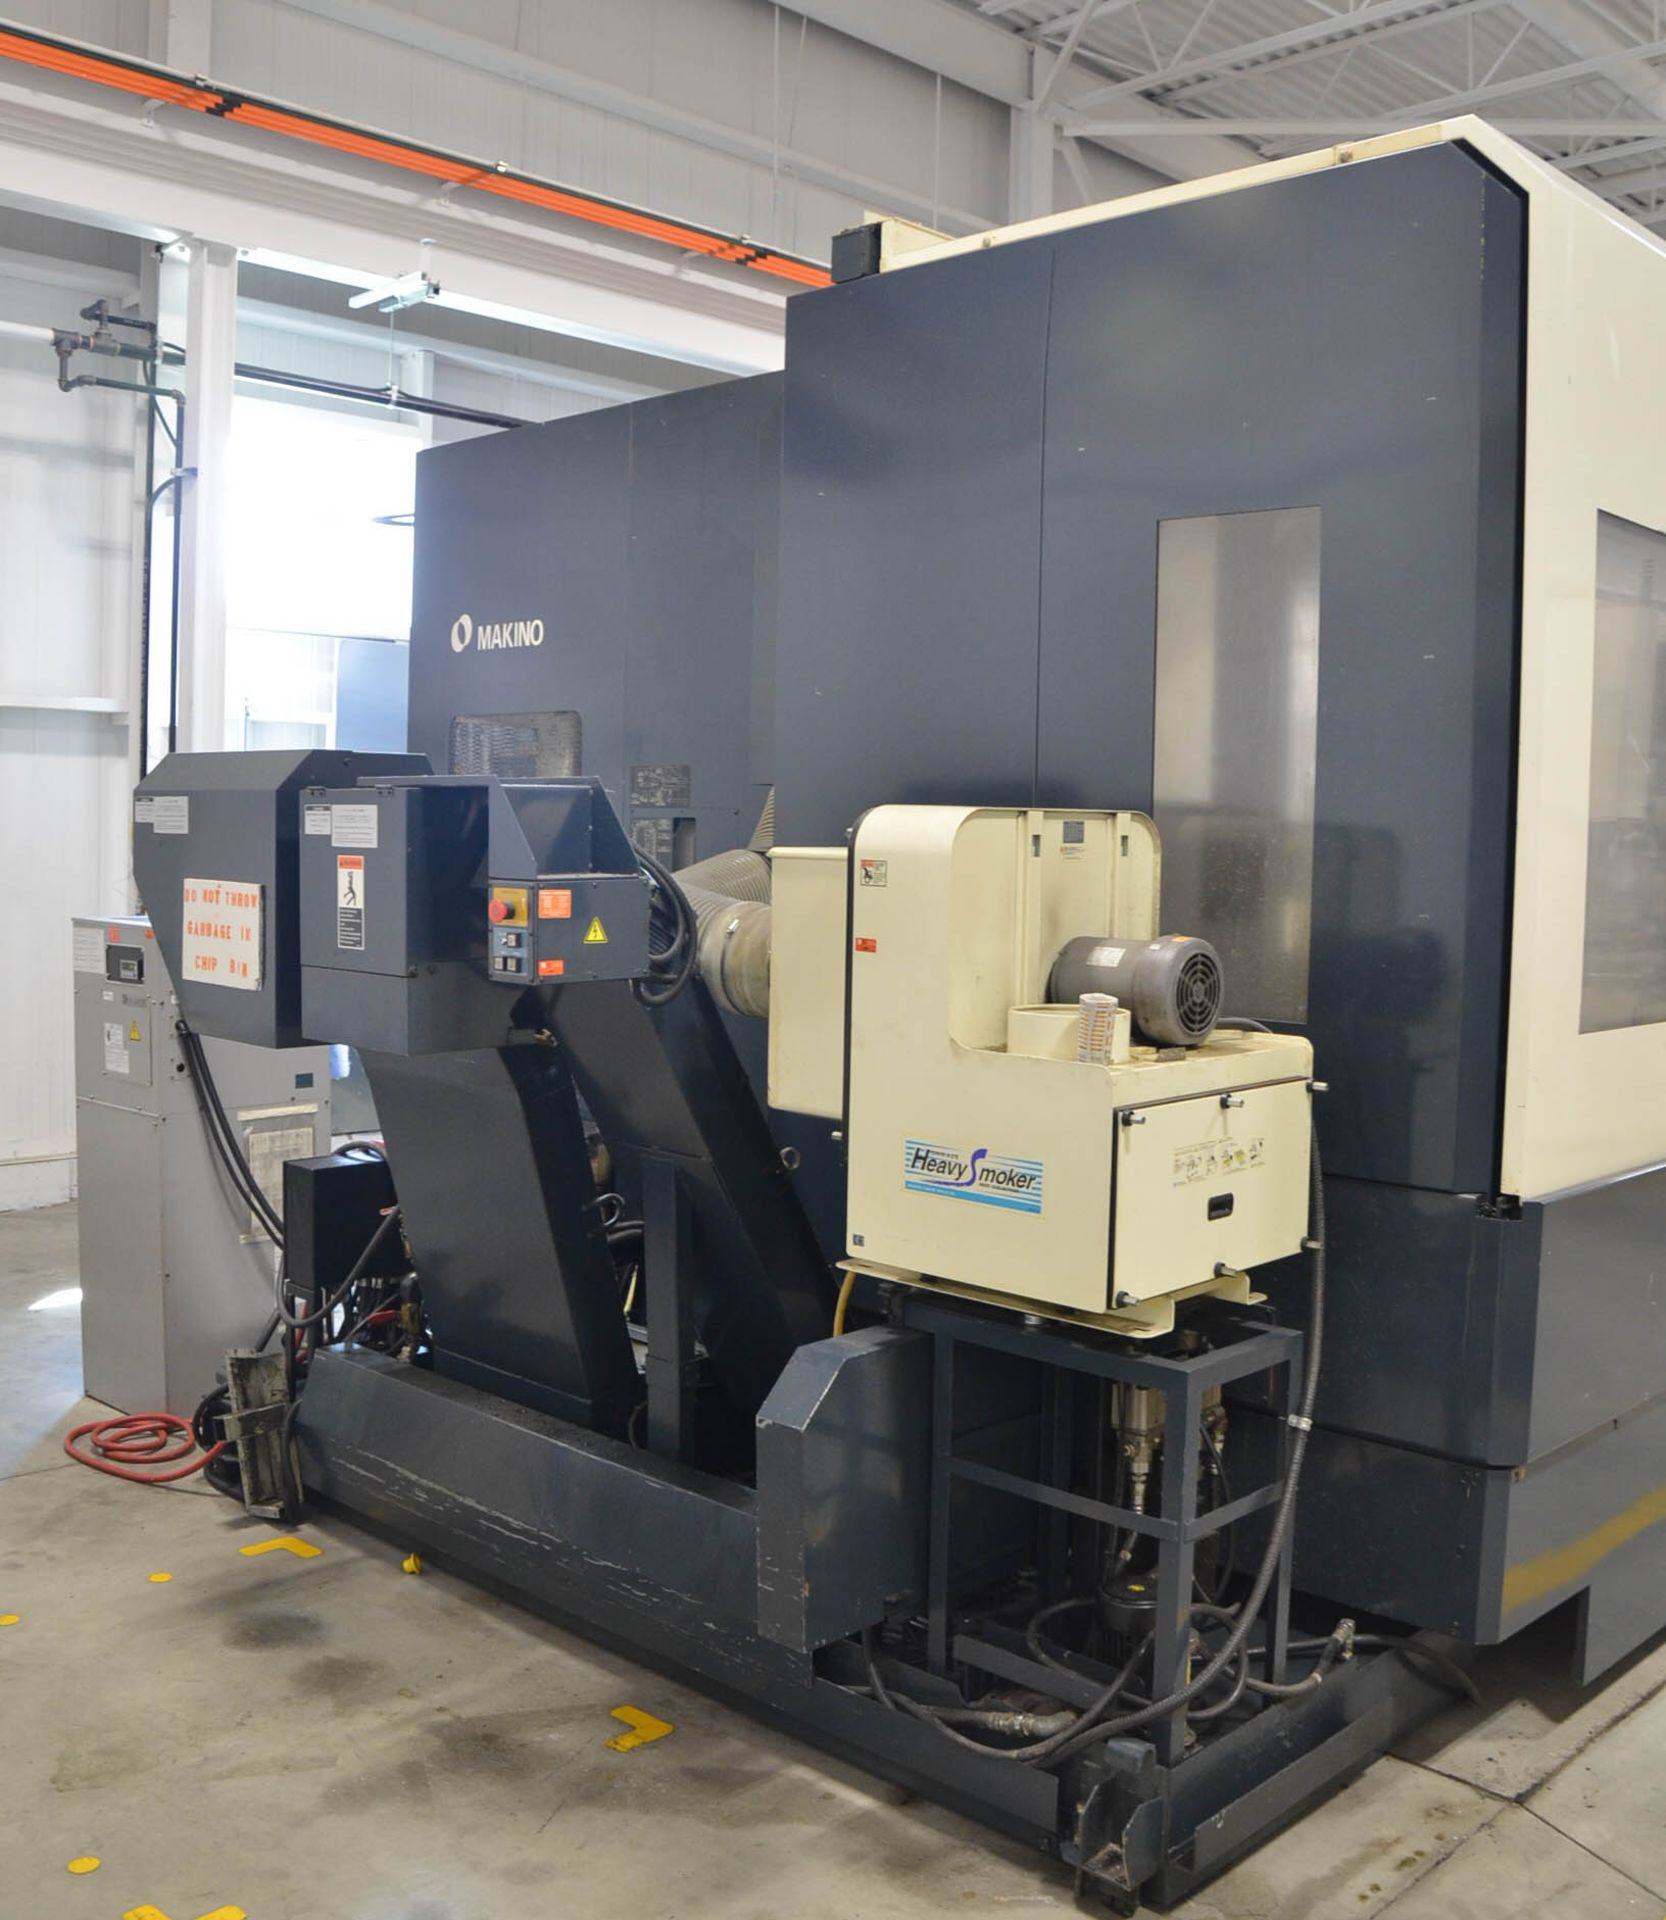 MAKINO (2008) MCC2013 4-AXIS HORIZONTAL MACHINING CENTER WITH MAKINO PROFESSIONAL 5 CNC CONTROL, - Image 6 of 12